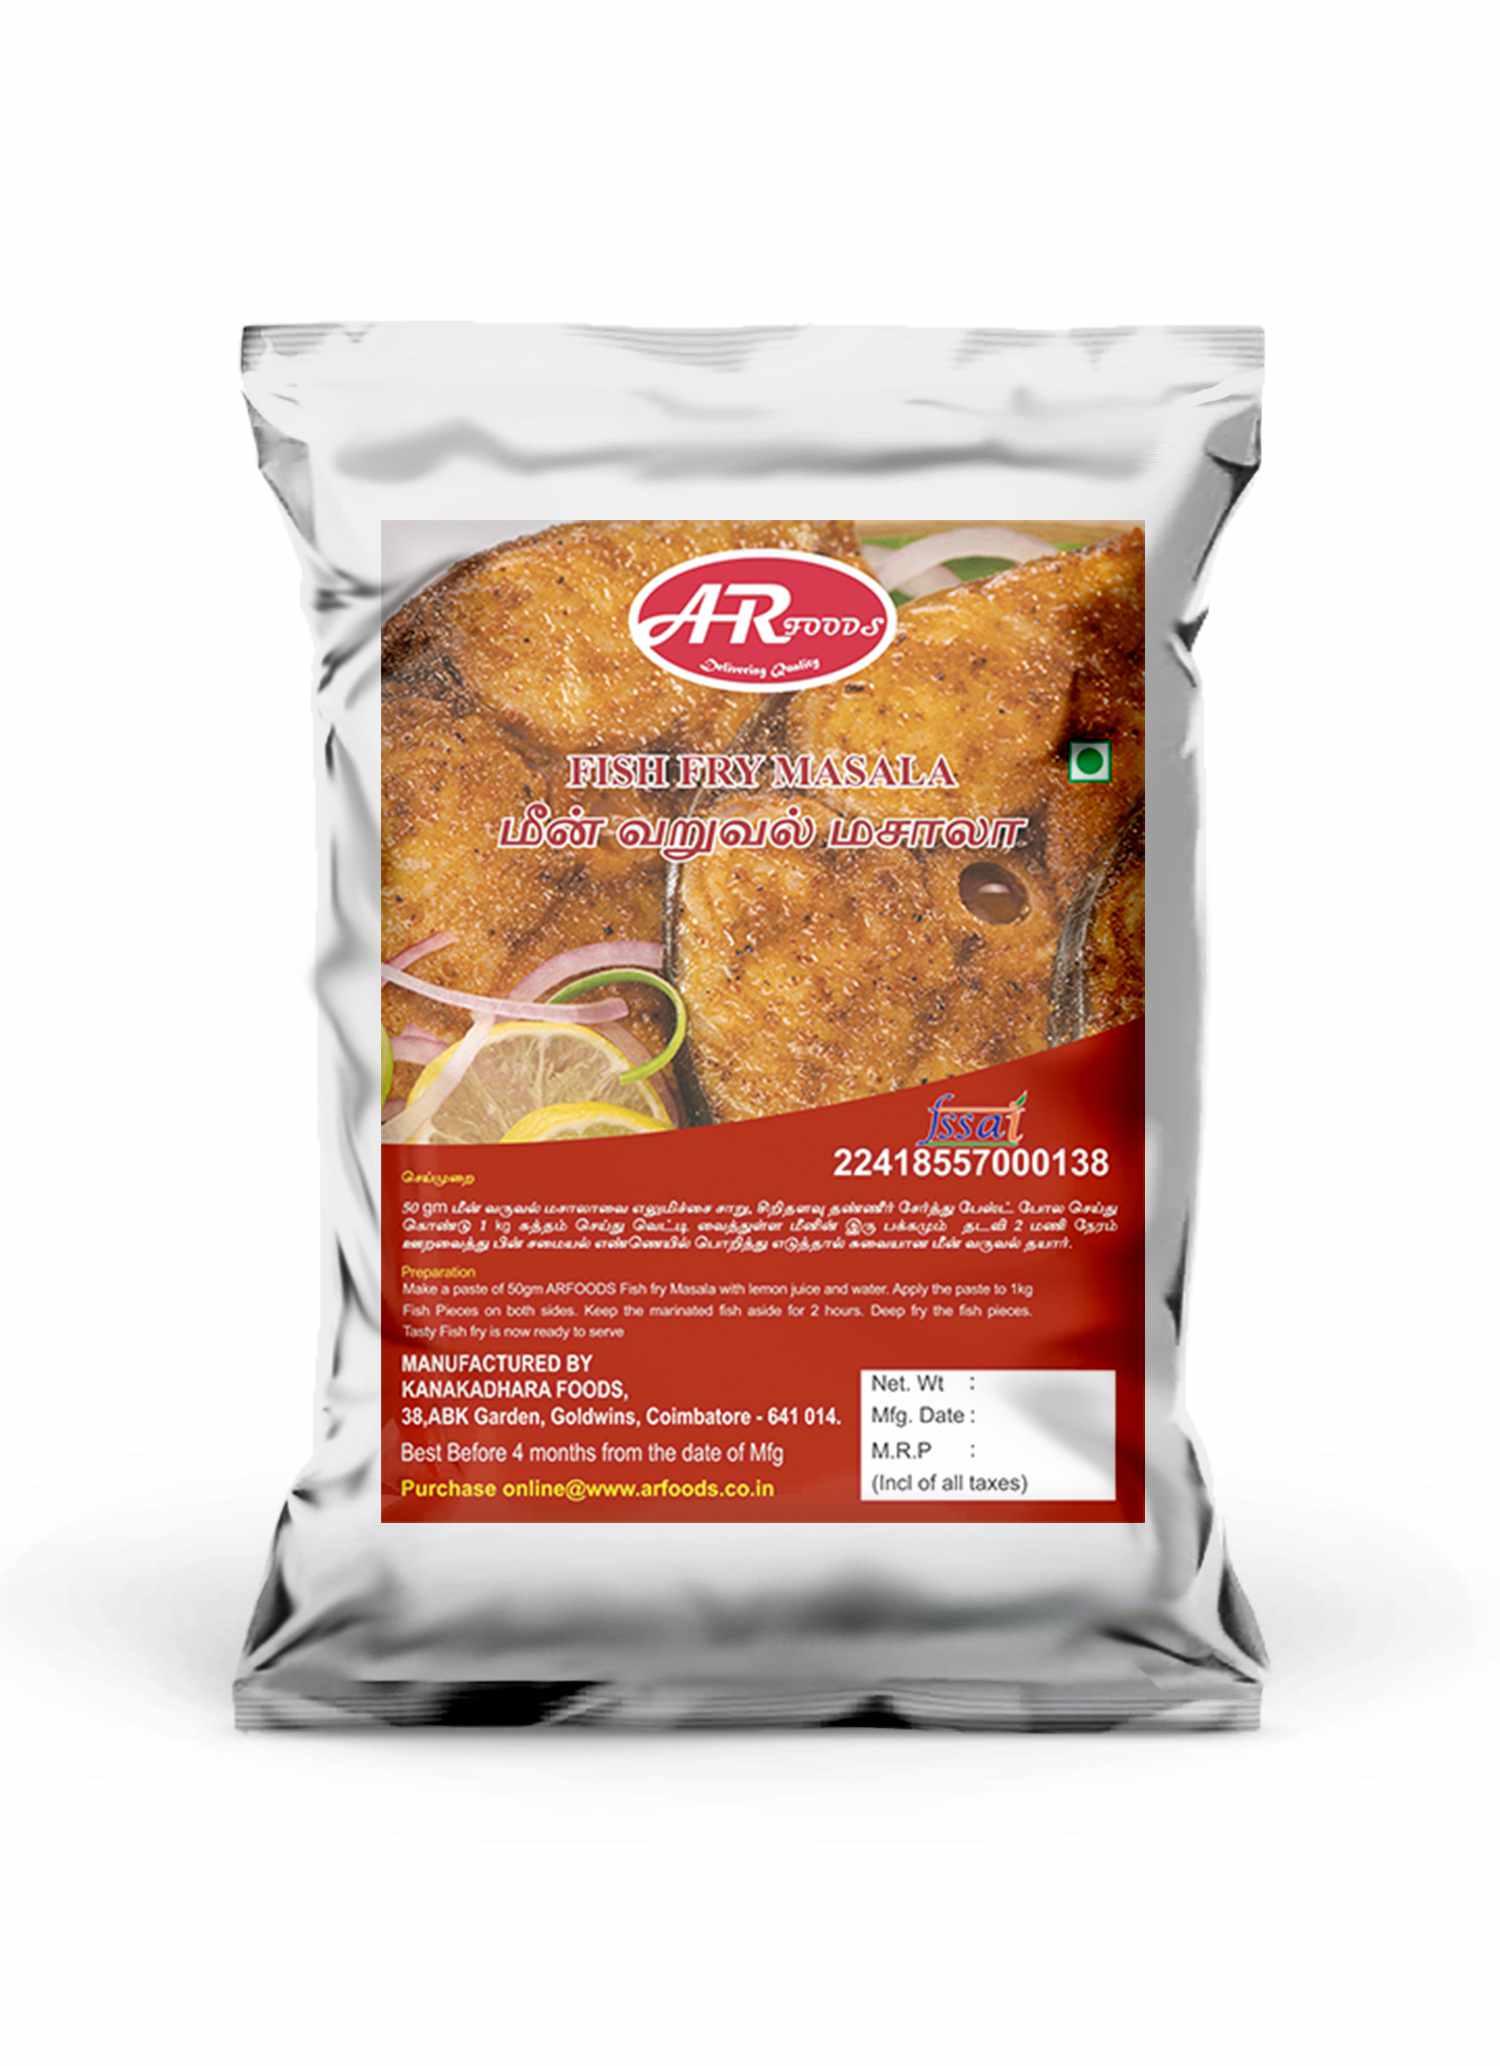 Fish fry_ar_foods_coimbatore